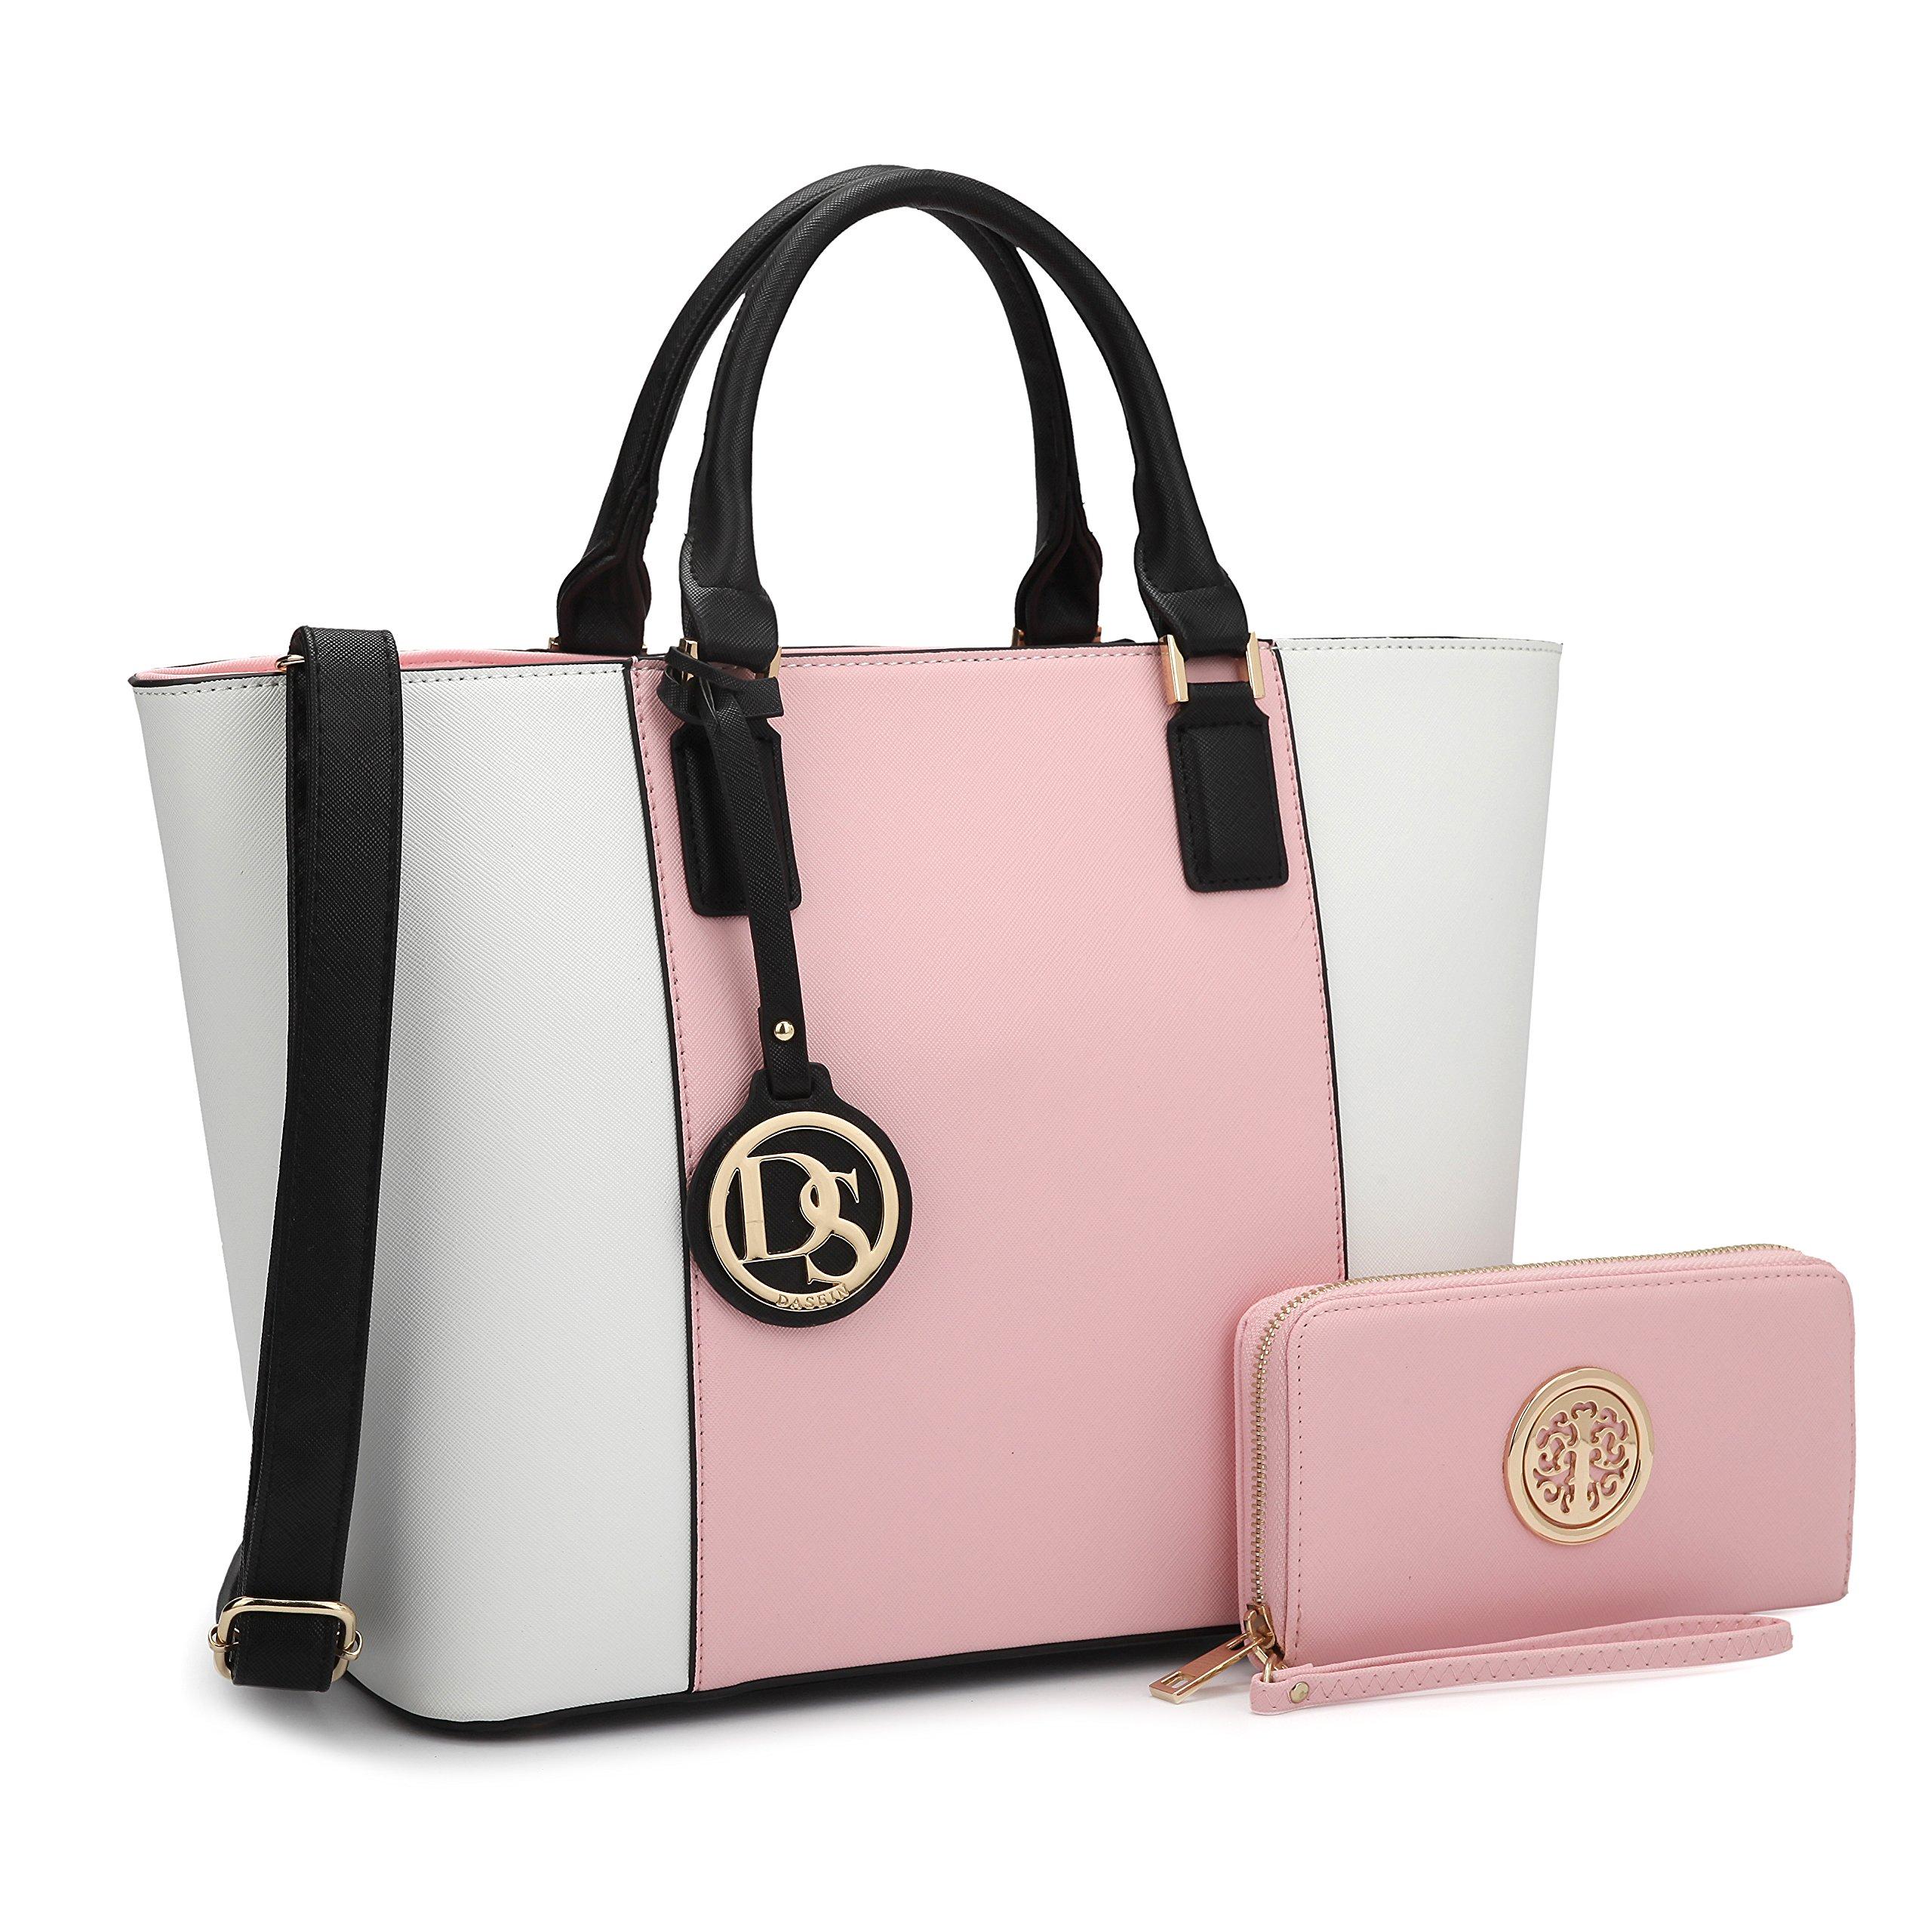 DASEIN Women's Handbags Purses Large Tote Shoulder Bag Top Handle Satchel Bag for Work by Dasein